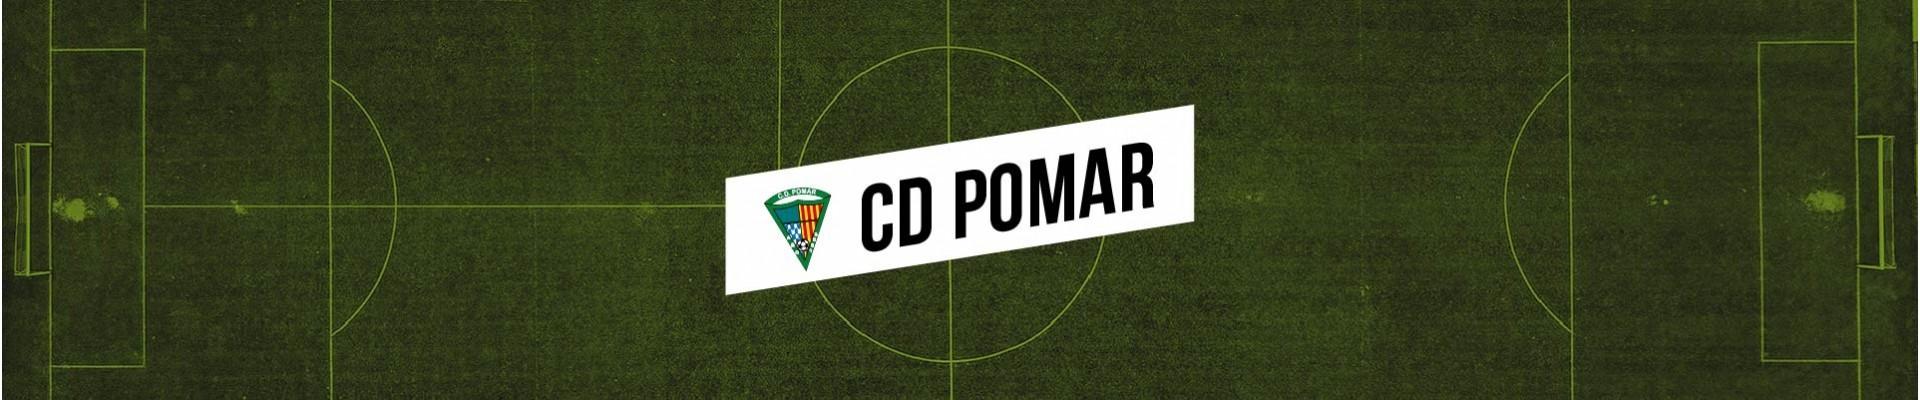 CD POMAR